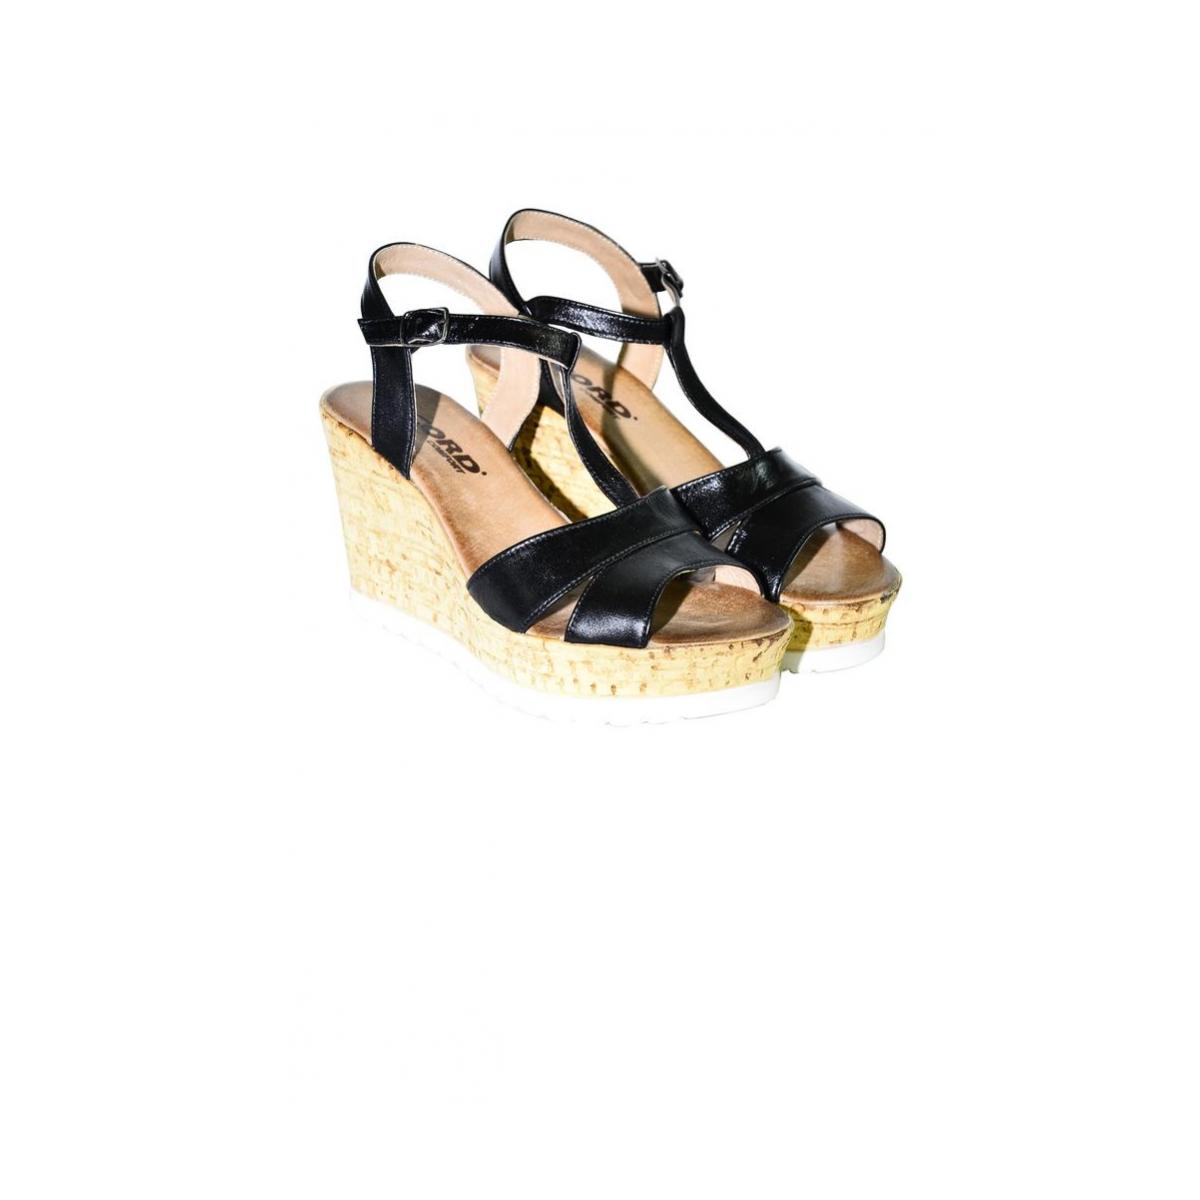 66b80af48d9f Dámske čierne letné sandále JENSE - 2